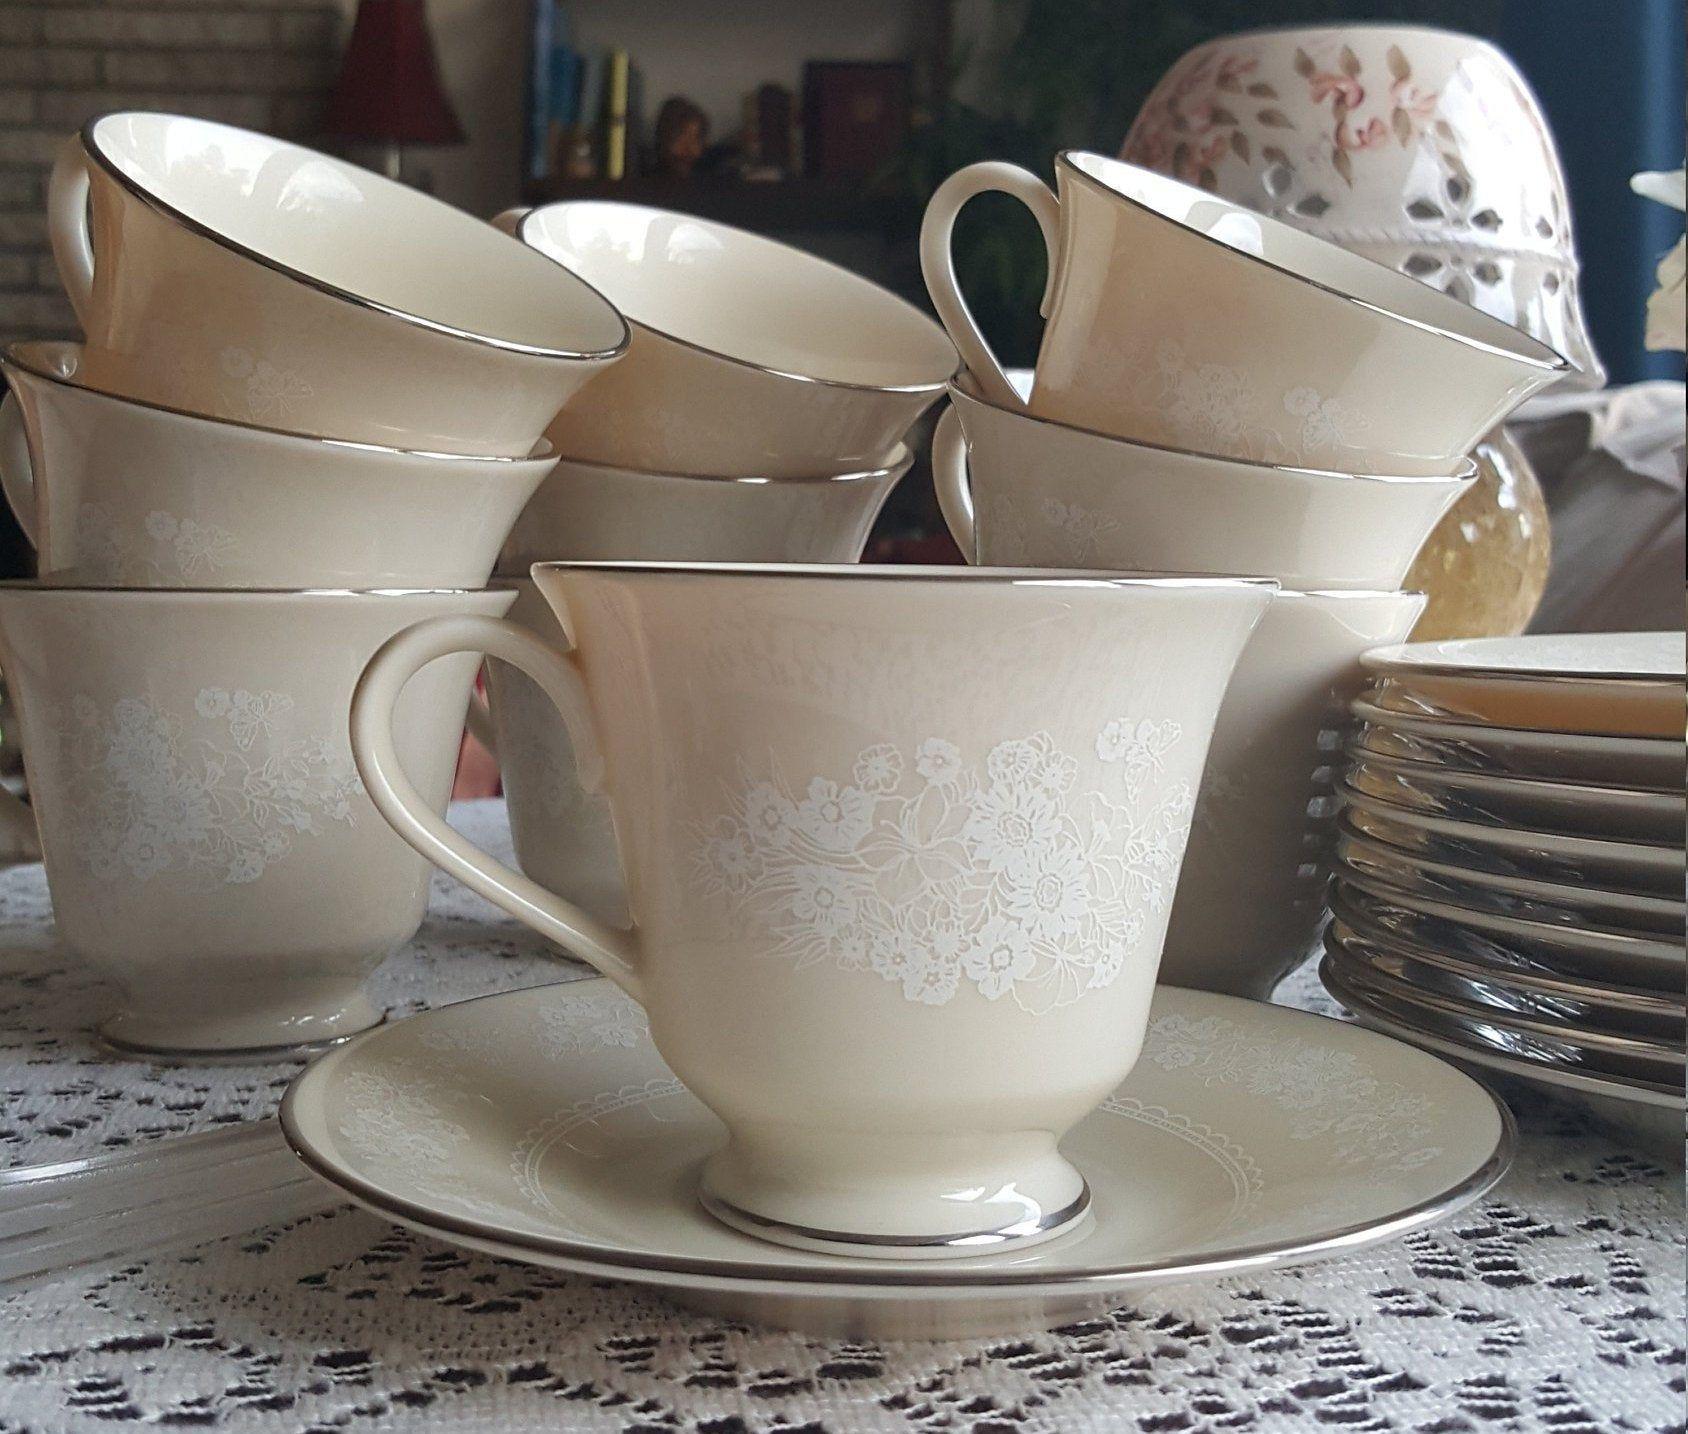 Set of 12 LENOX Snow Flower Teacups and Saucer Set 24